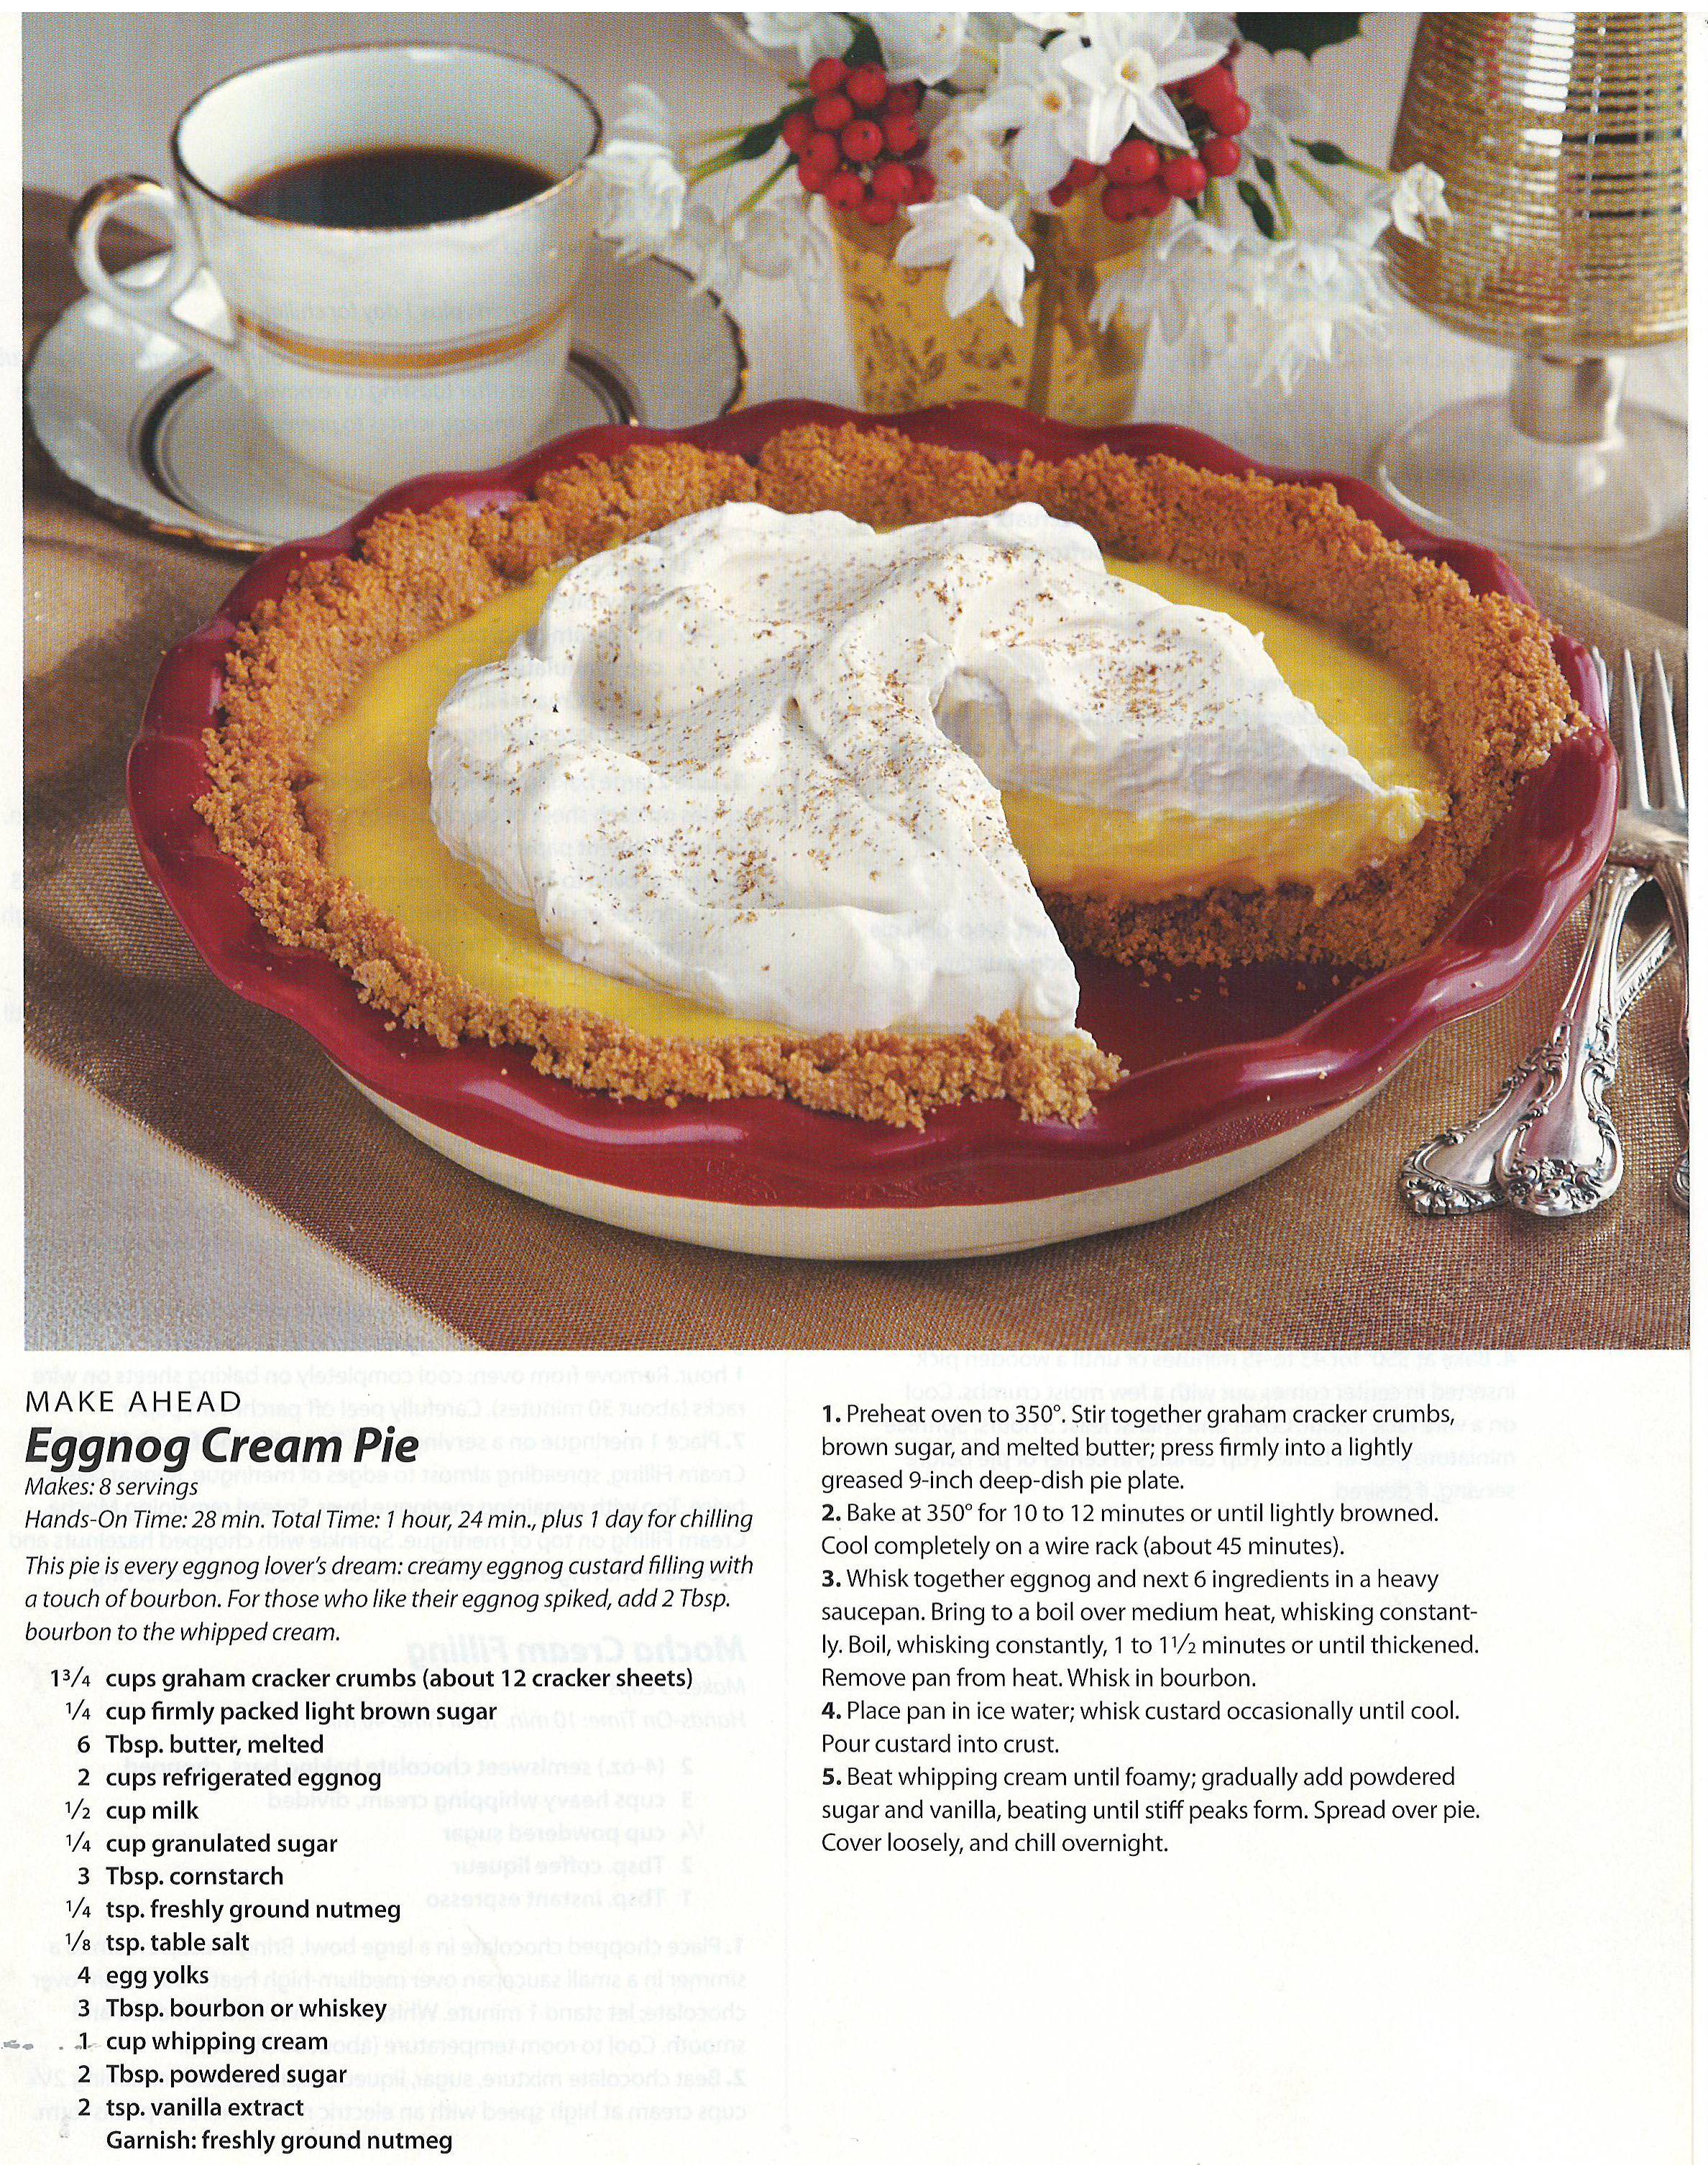 Eggnog Cream Pie | Recipes and food related ideas | Pinterest